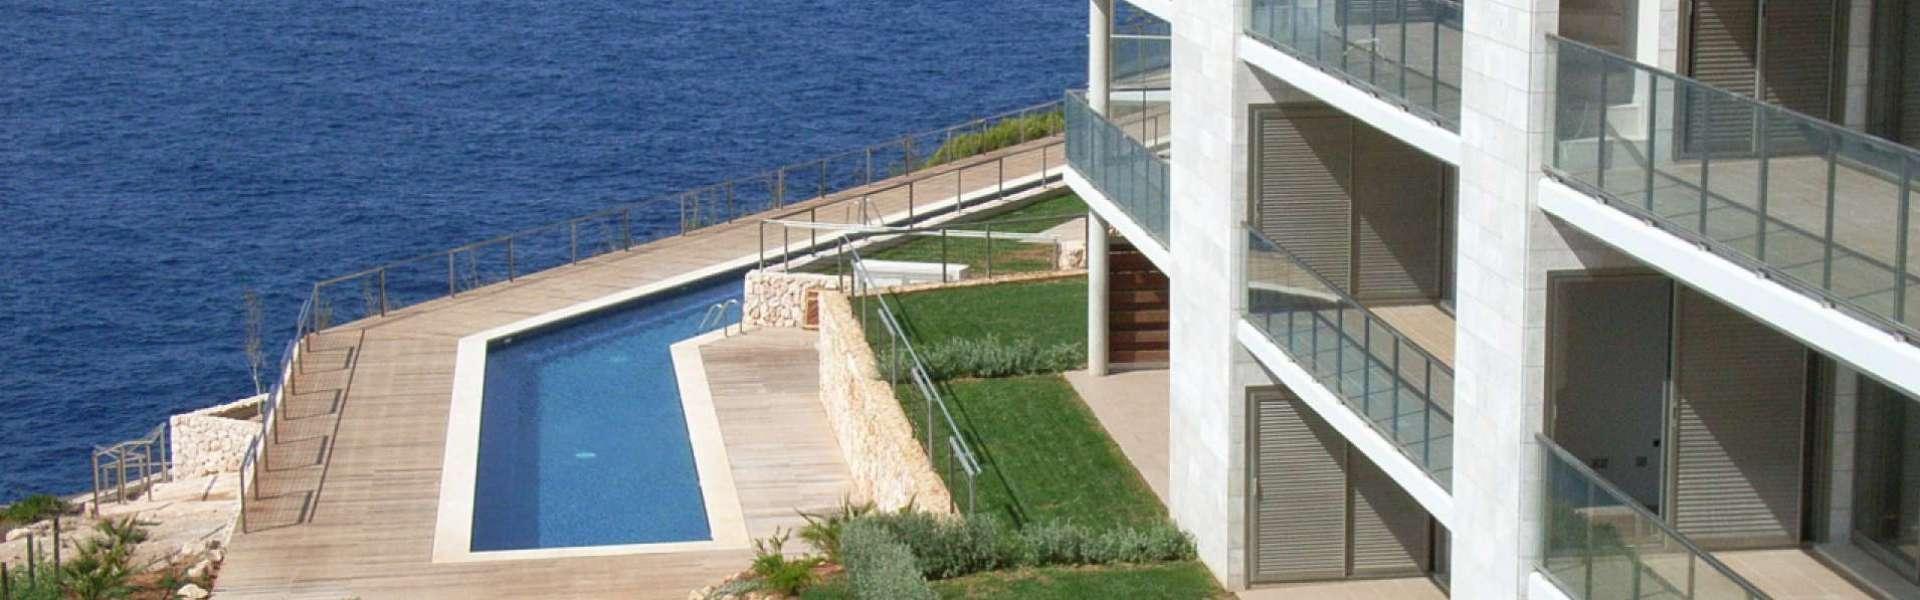 Cala Figuera - Penthousewohnung in spektakulärer Lage